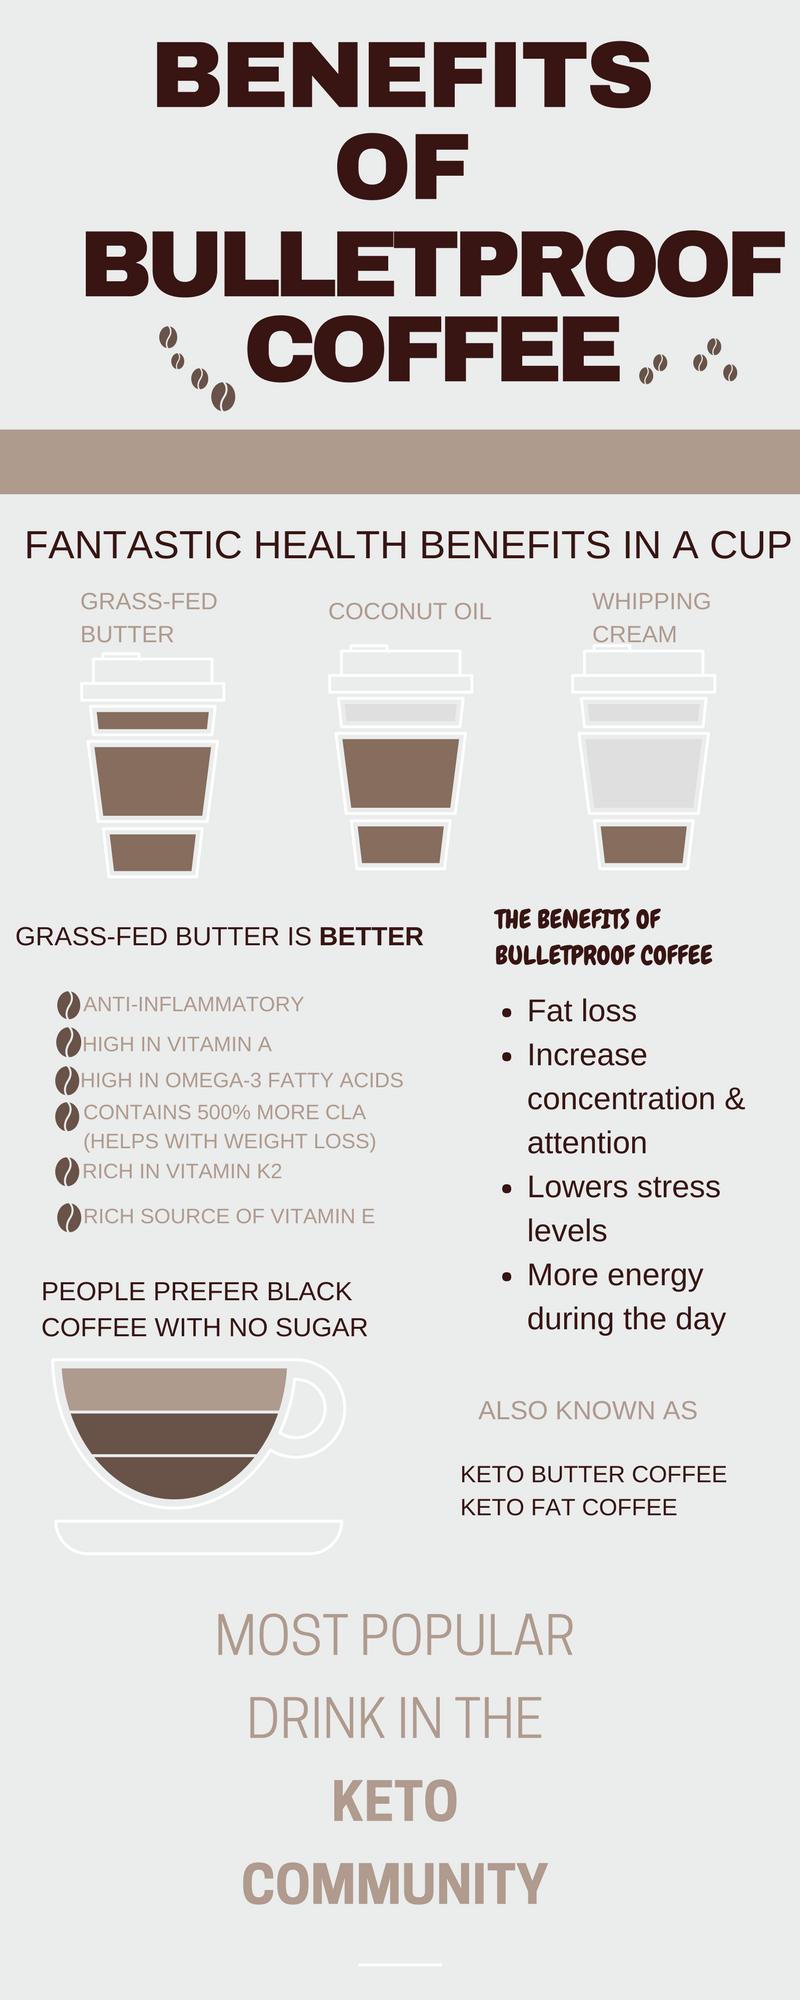 Easy Bulletproof Coffee How To Make Bpc Or Keto Coffee Recipe Bulletproof Coffee Benefits Bulletproof Coffee Bulletproof Coffee Recipe